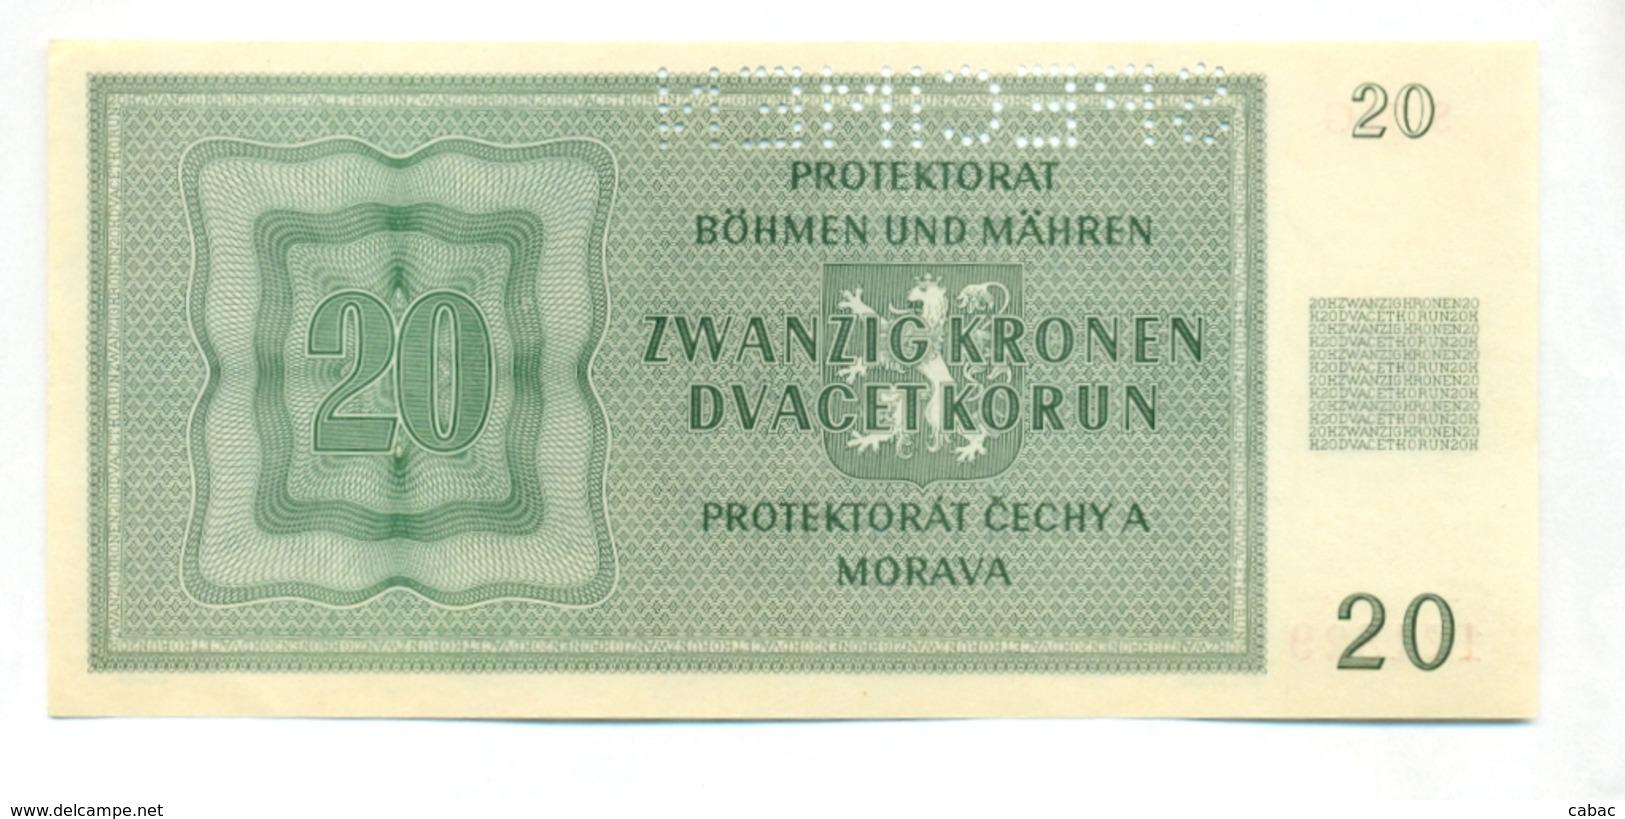 Čechya Morava, Dvacet Korun, 20 Korun, Zwanzig Kronen, PROTEKTORAT, 1944, SPECIMEN, S. 34G, Bohemia Moravia - Tchécoslovaquie